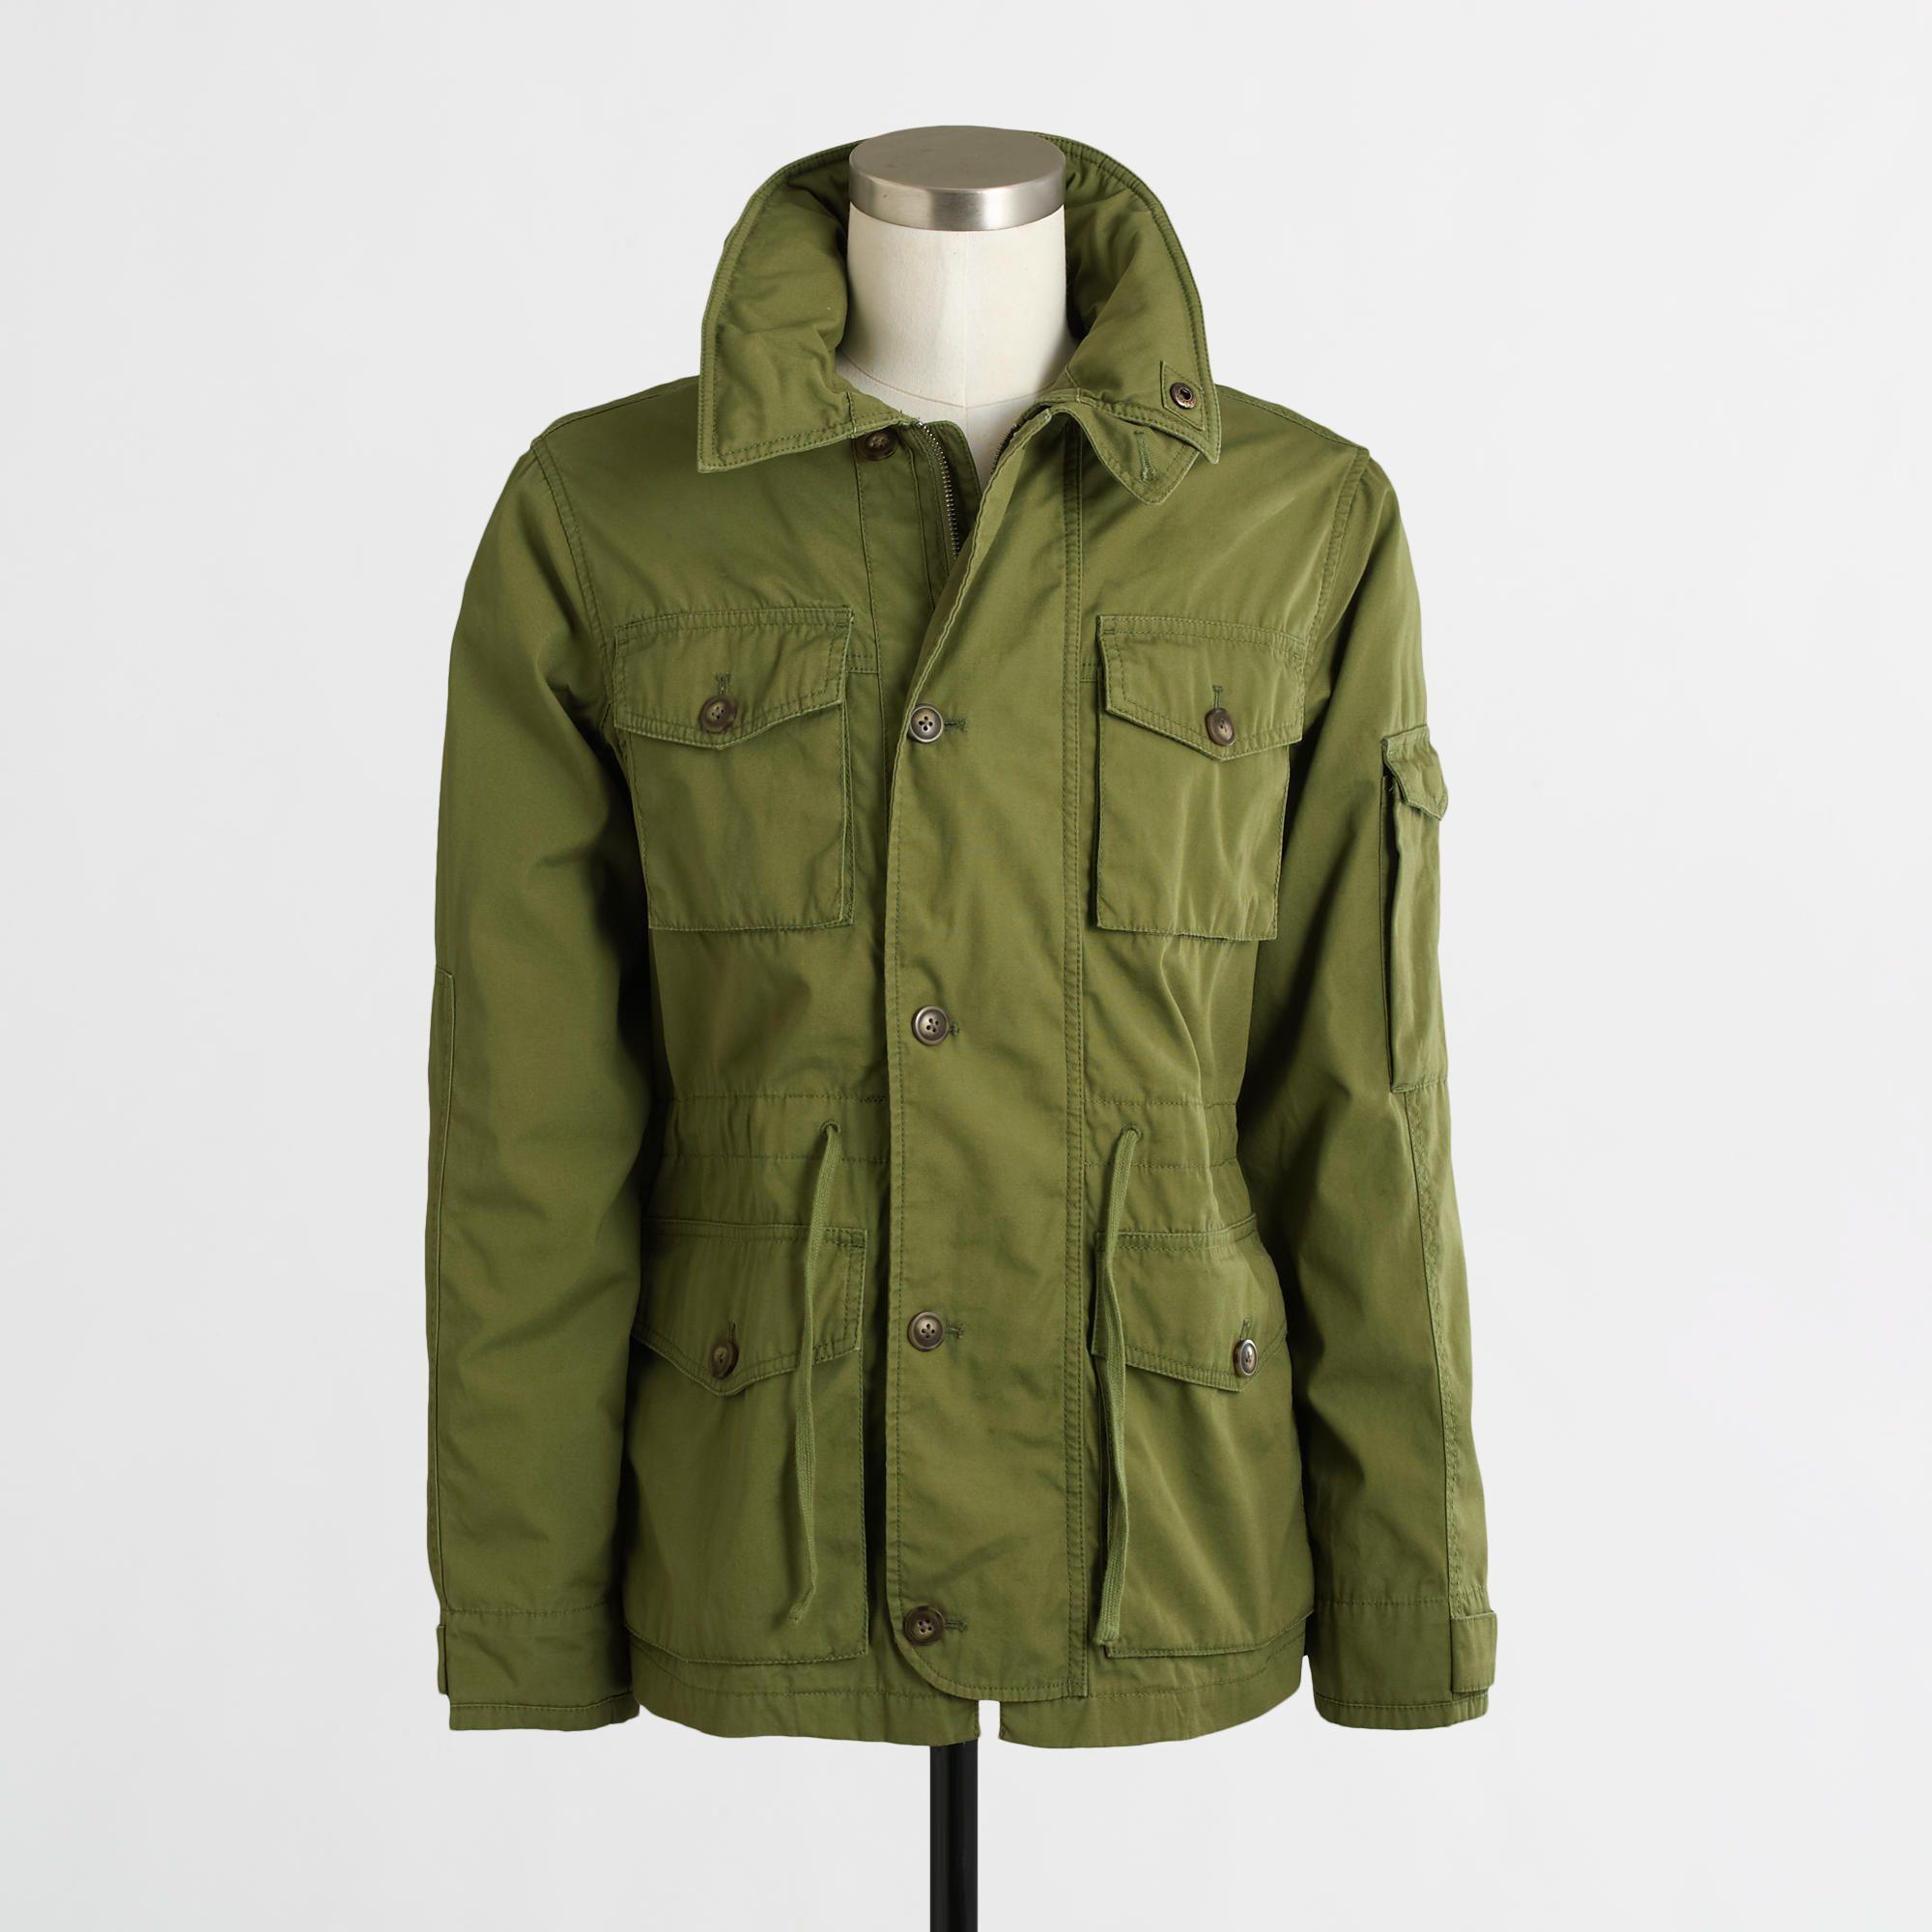 Factory Utility Jacket Mens Jackets Mens Zip Up Jackets Mens Outfits [ 2000 x 2000 Pixel ]